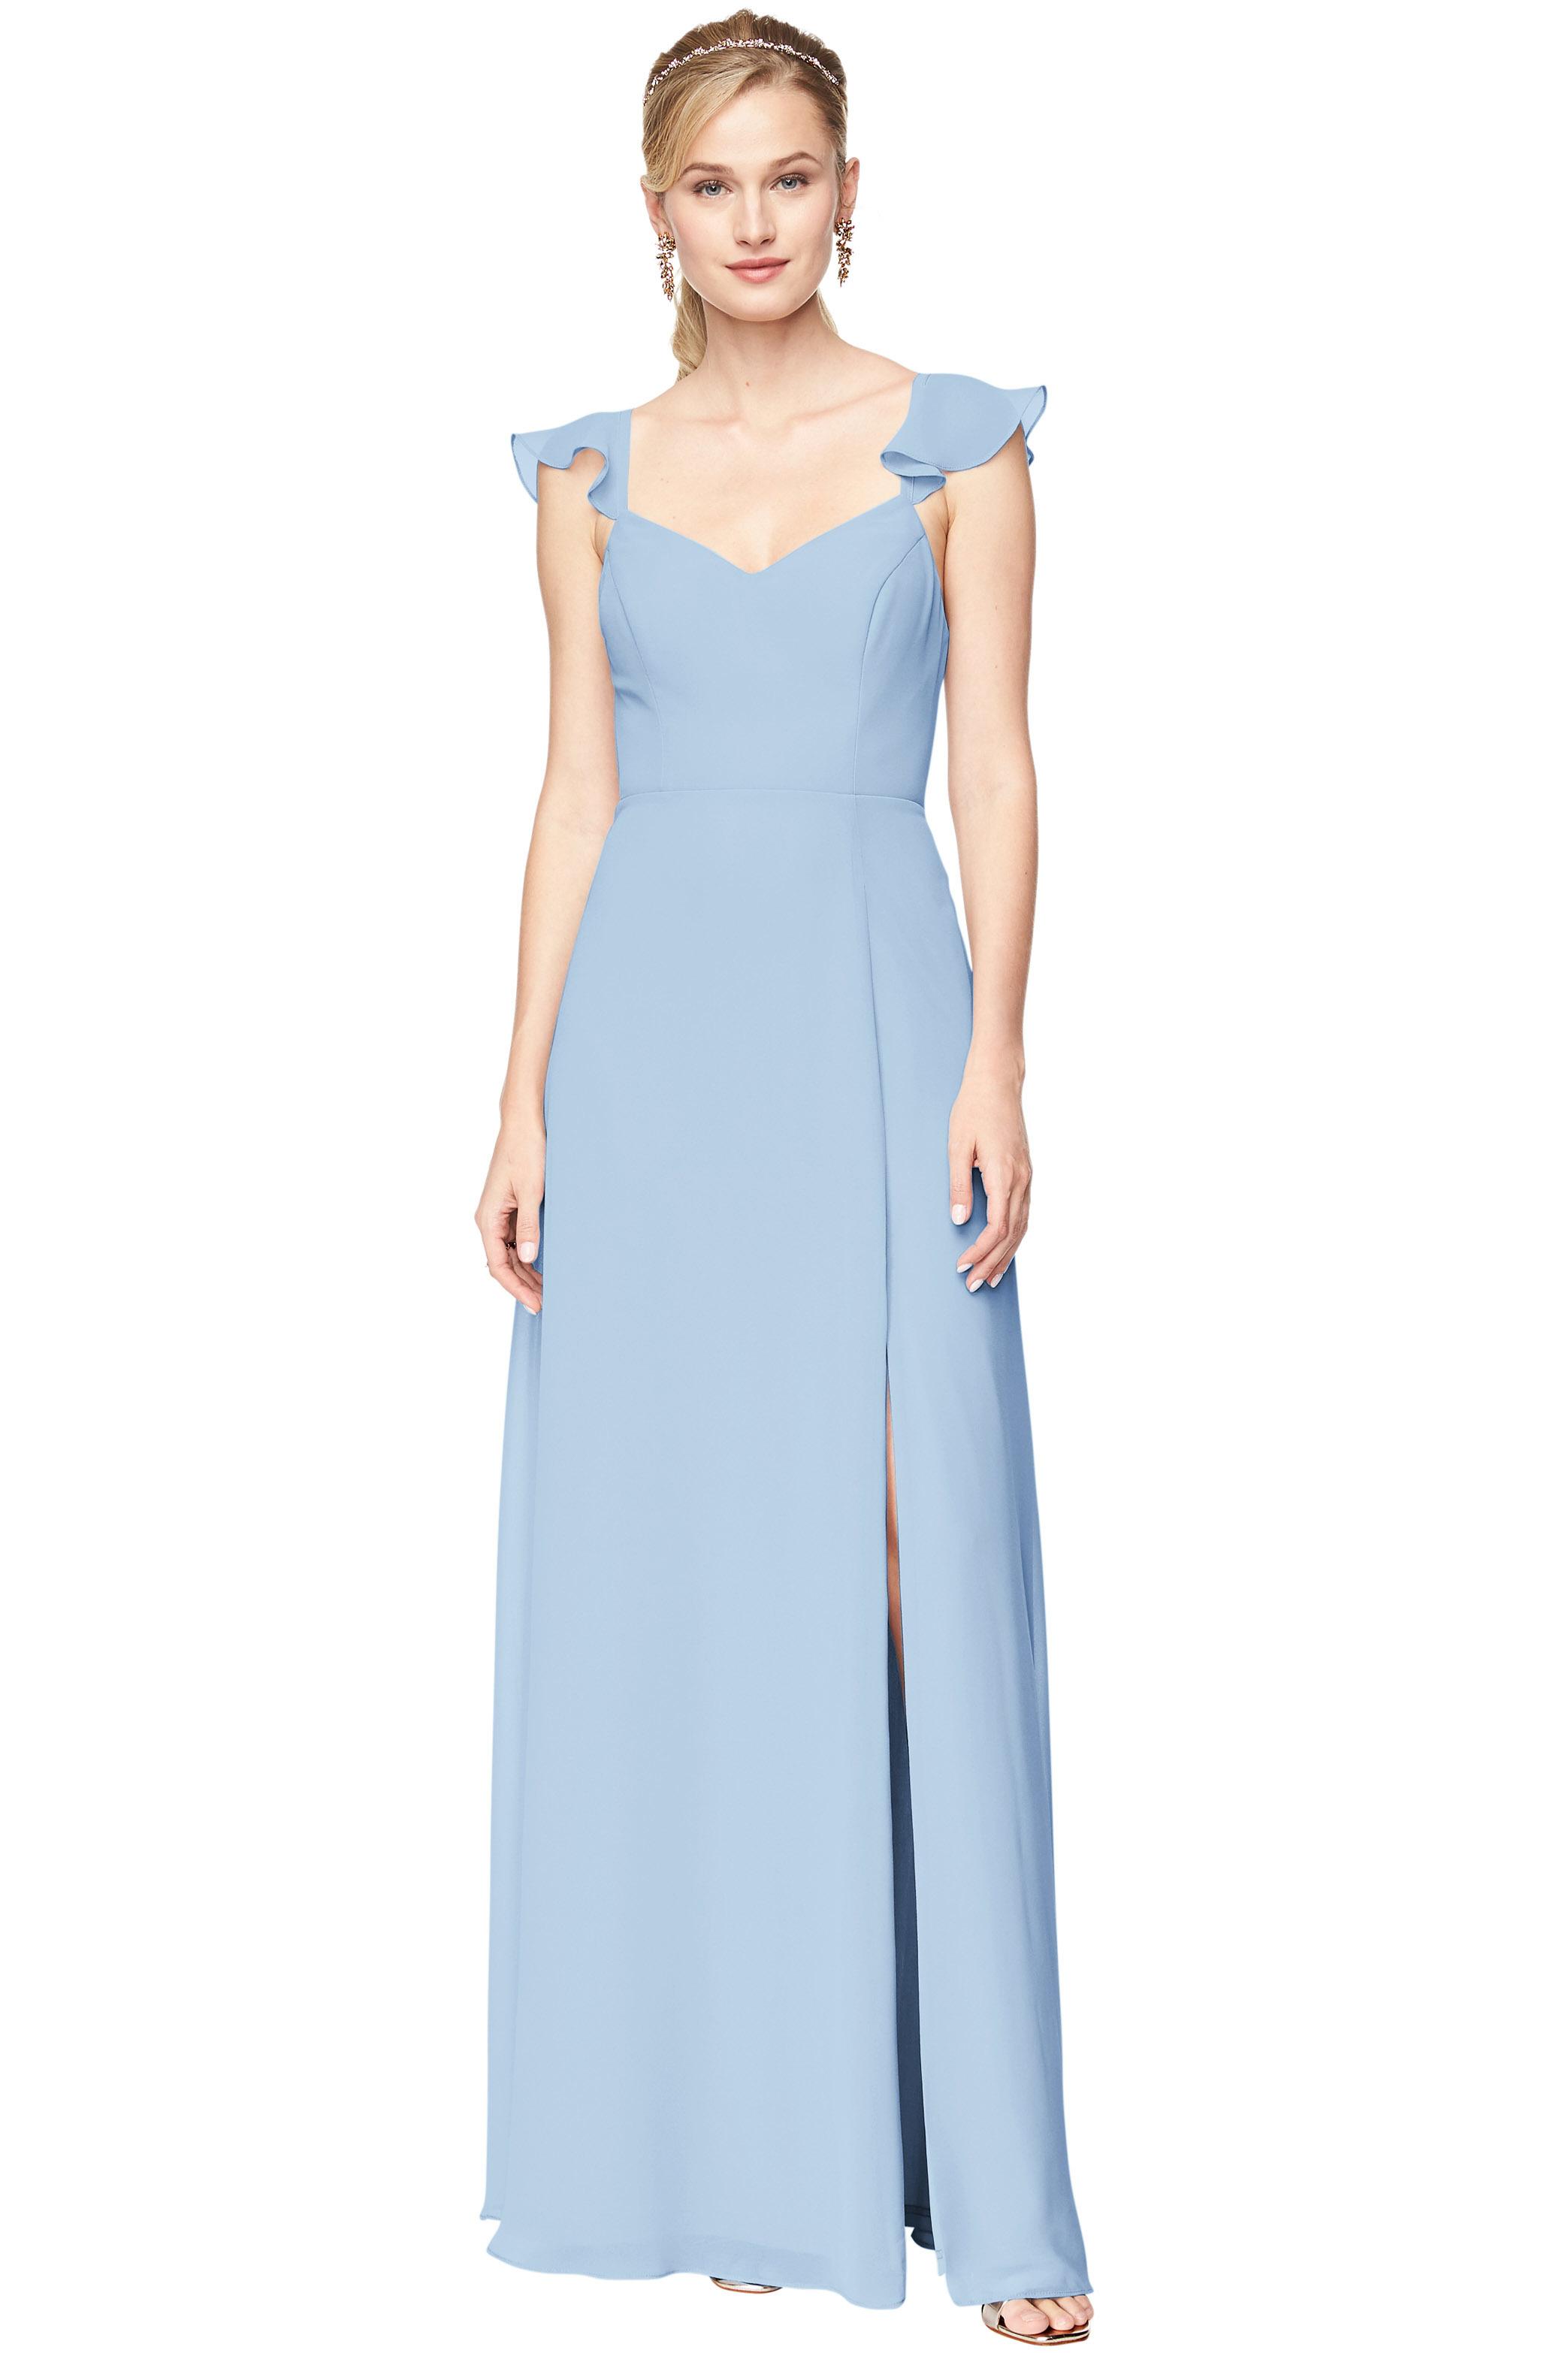 Bill Levkoff CAPRI Chiffon V-Neck, Cap Sleeve A-line gown, $168.30 Front